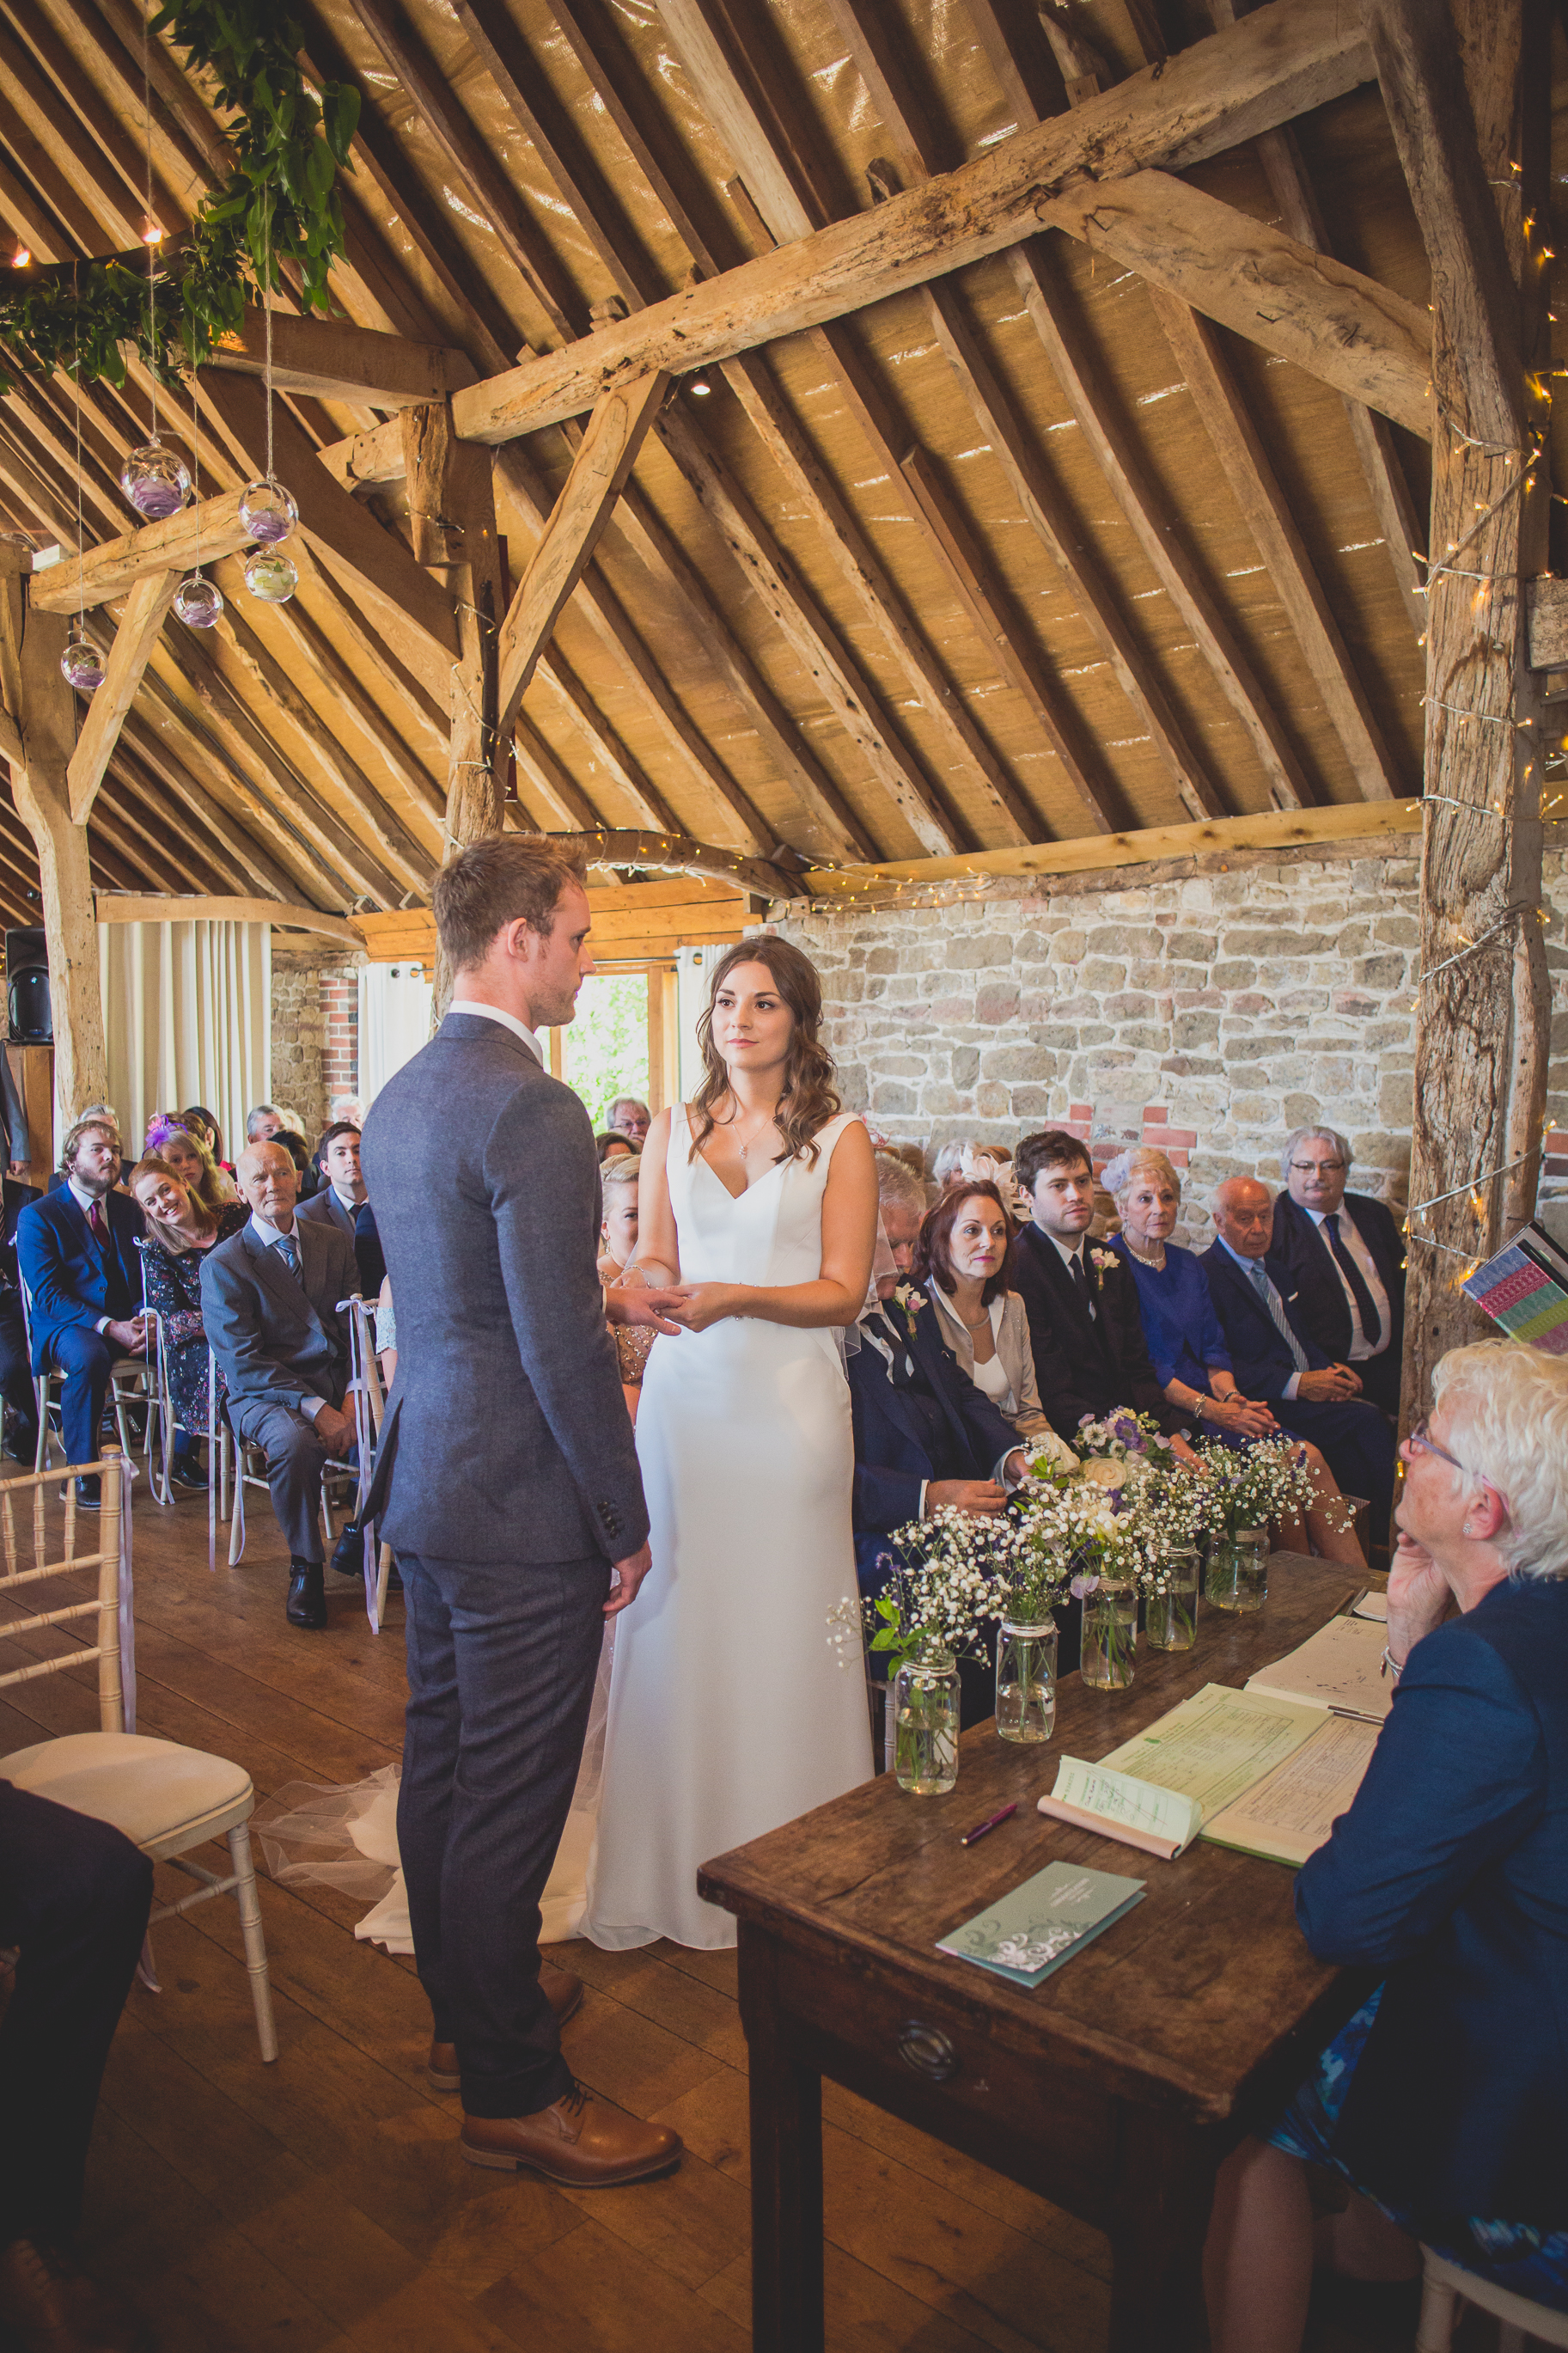 Grittenham Barn female wedding photographers west sussex petworth social-60.jpg